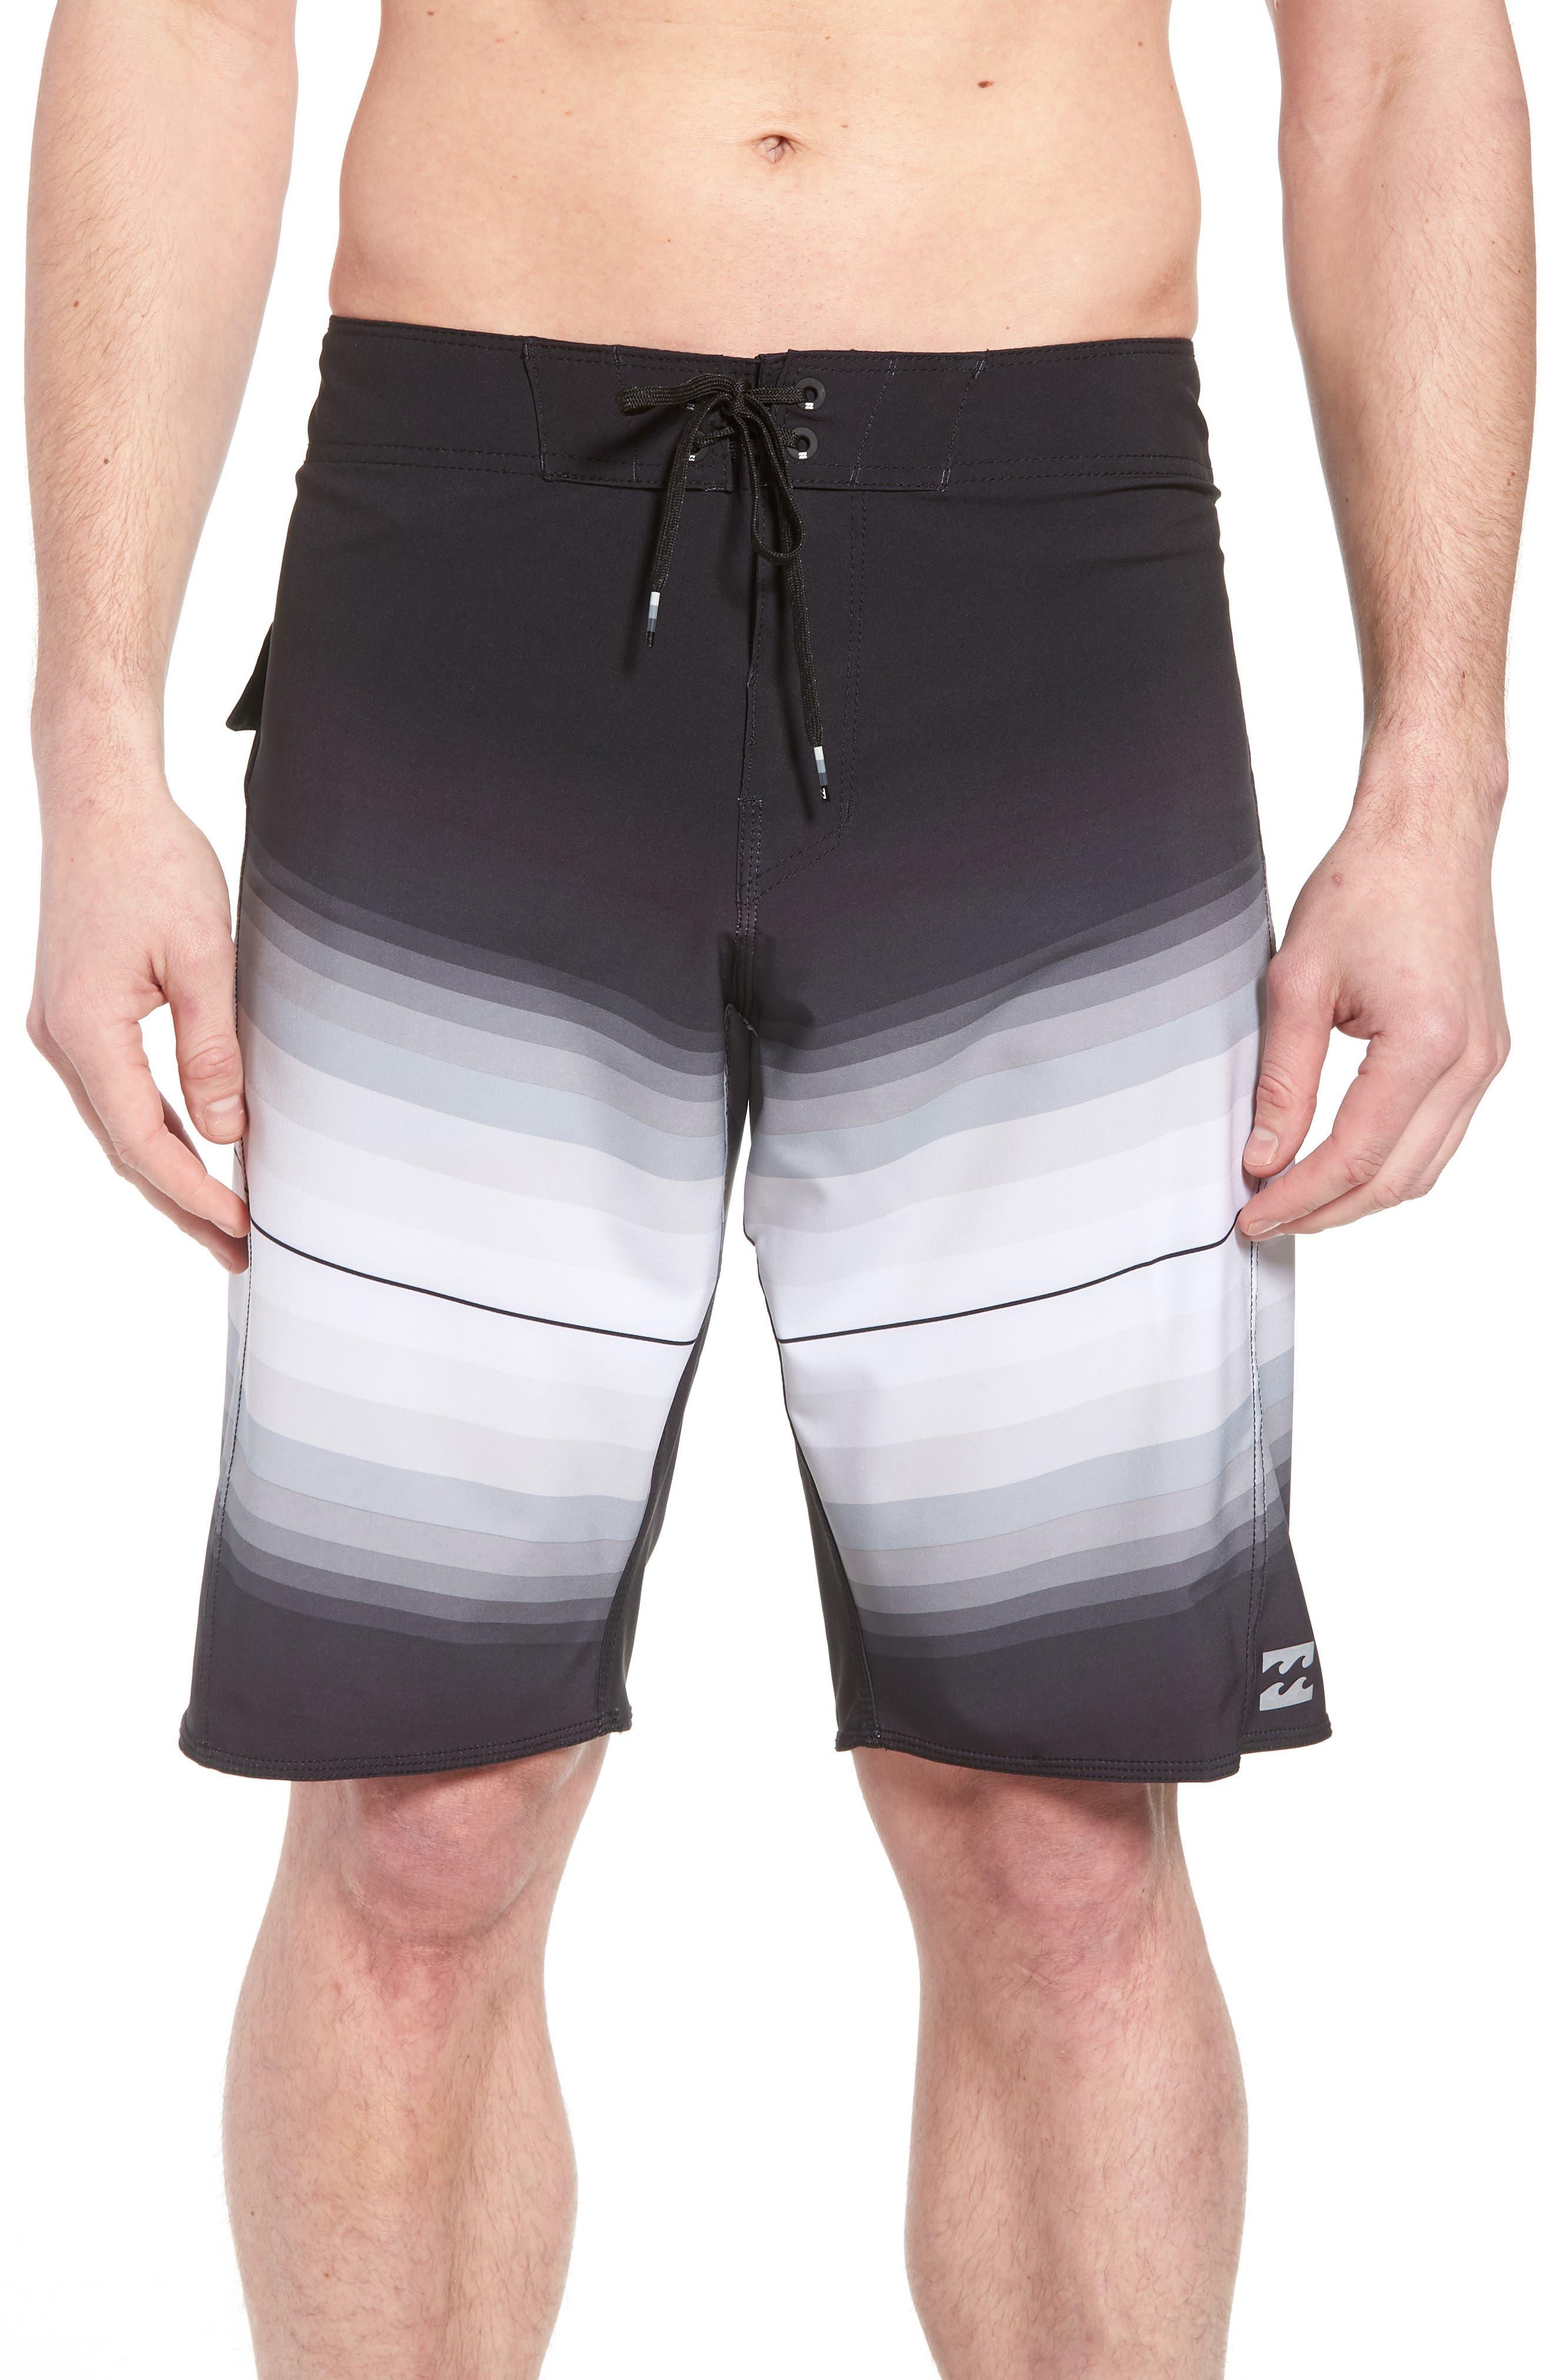 Fluid X Board Shorts,                         Main,                         color,